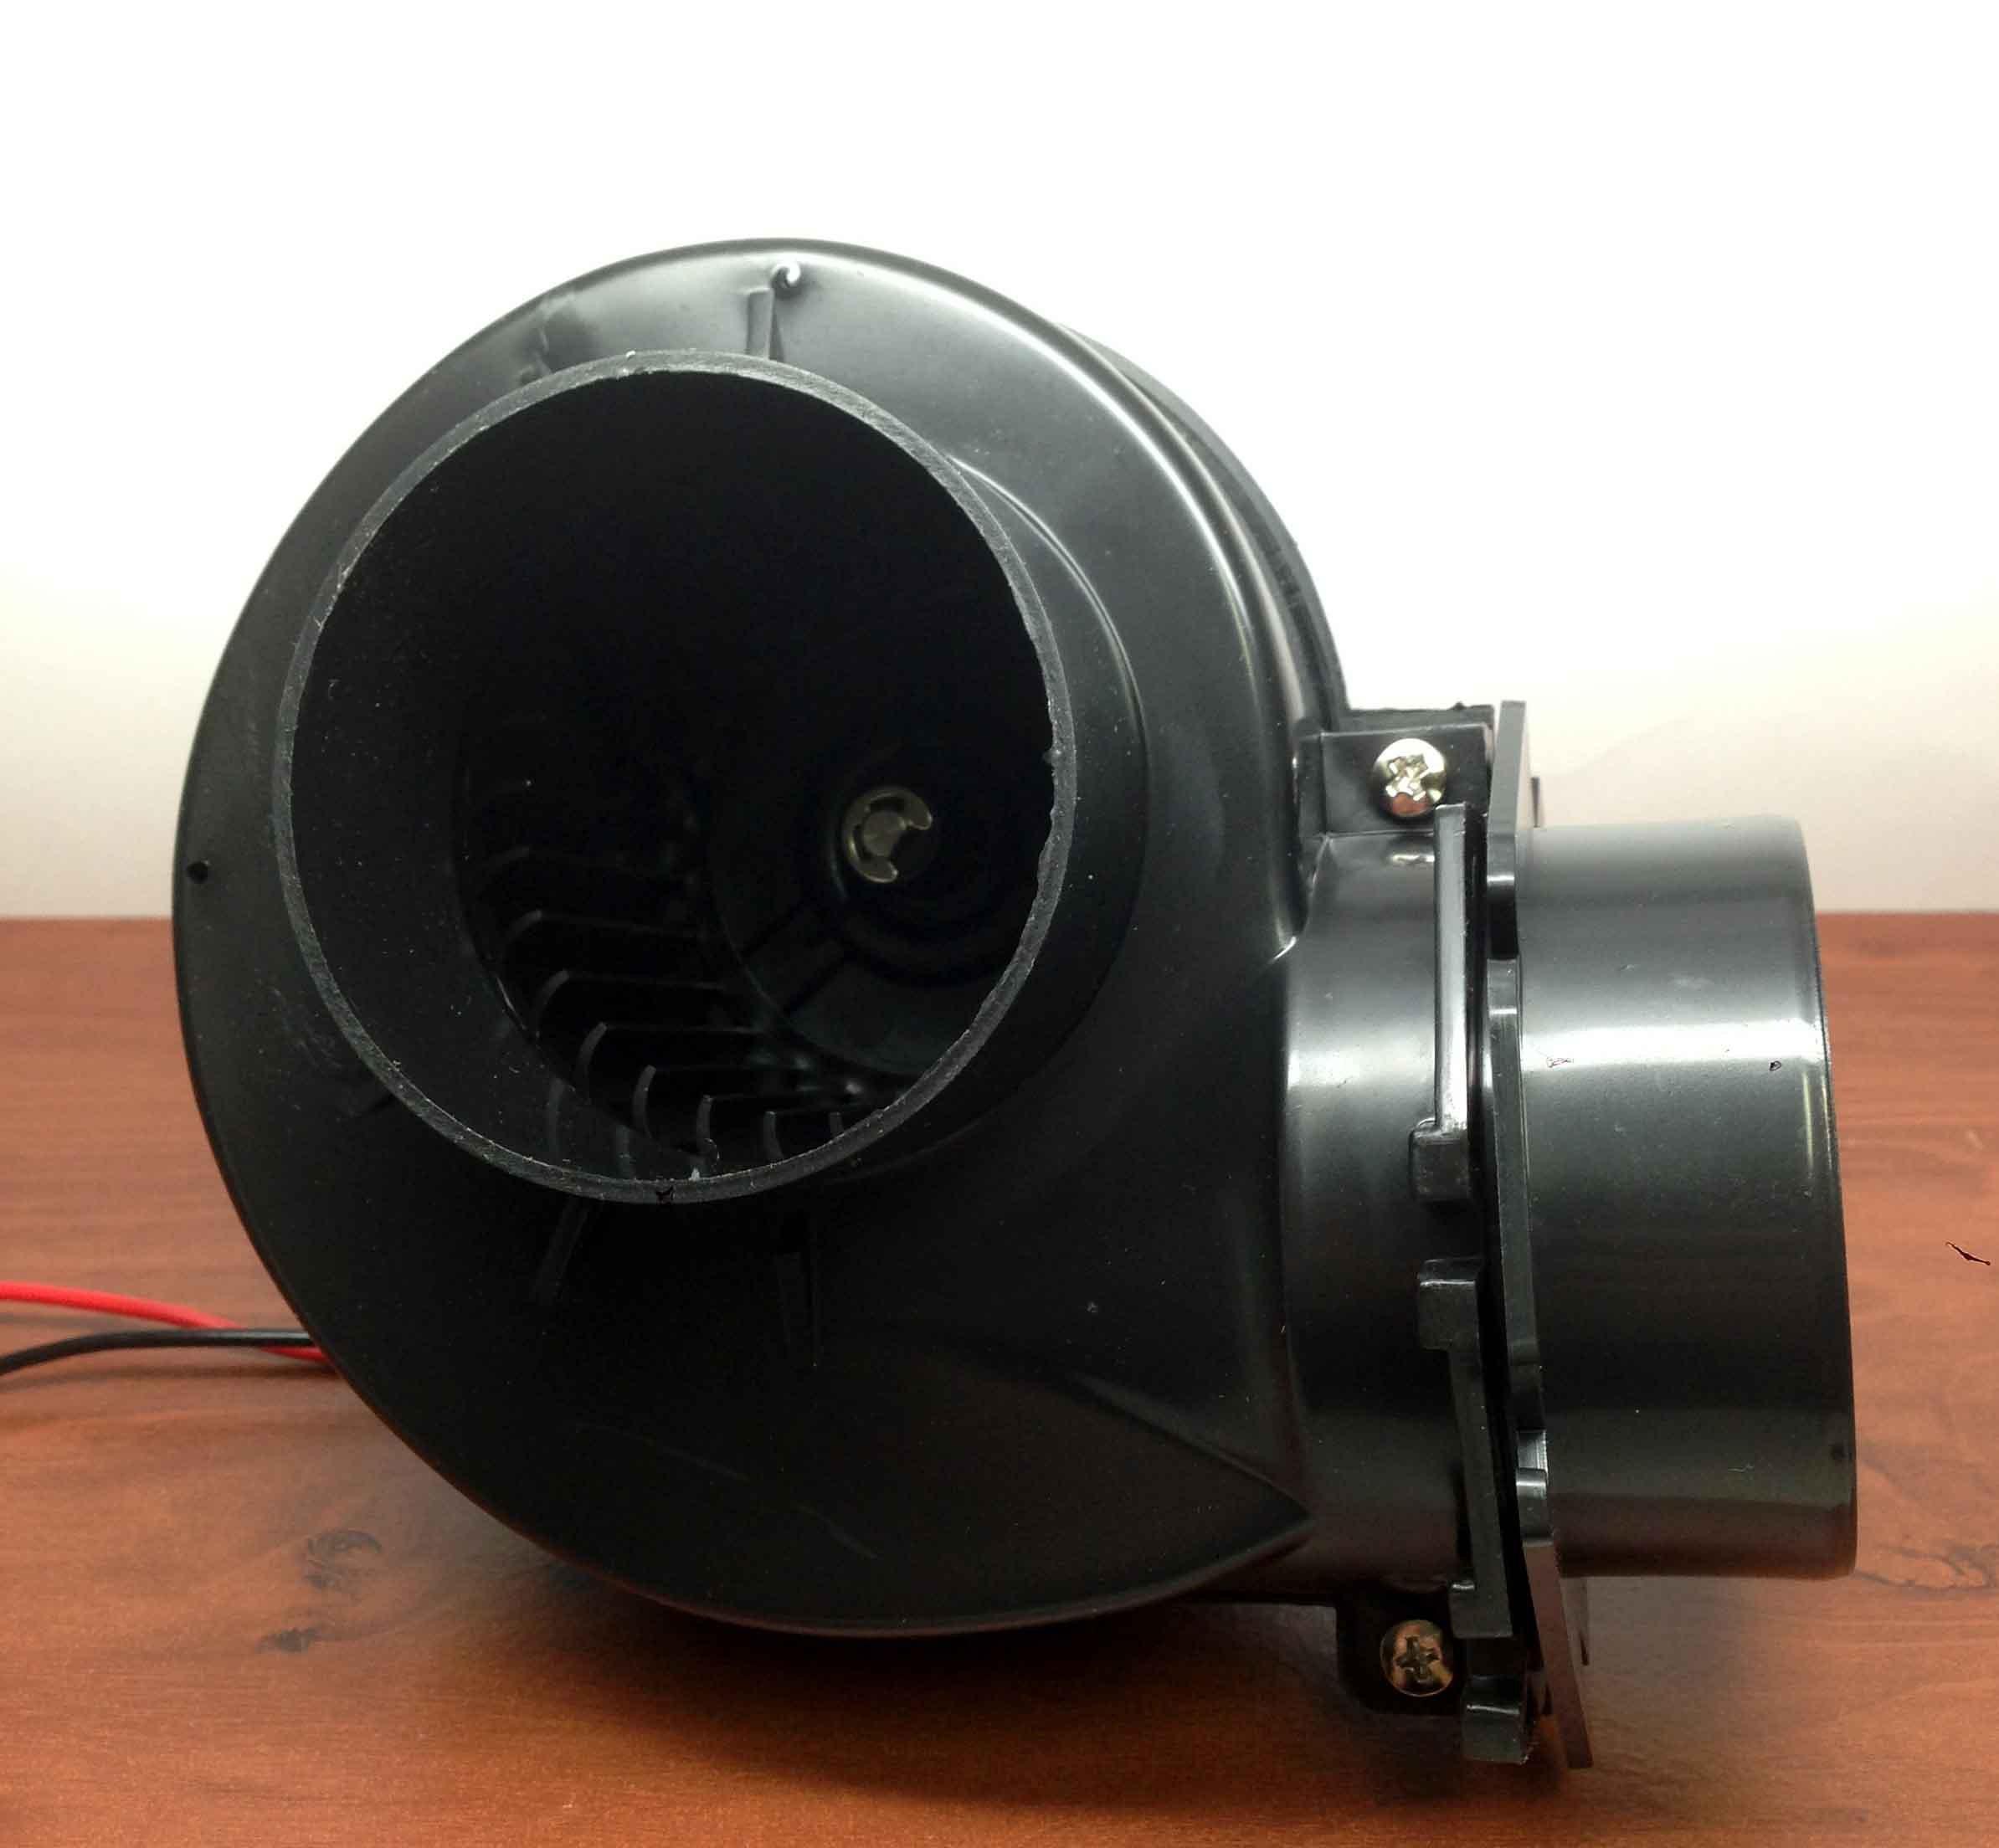 MARINE GRADE PLASTIC BILGE BLOWER 99 CuFt/Min 12VDC 3'' OPENING FLANGE MOUNT